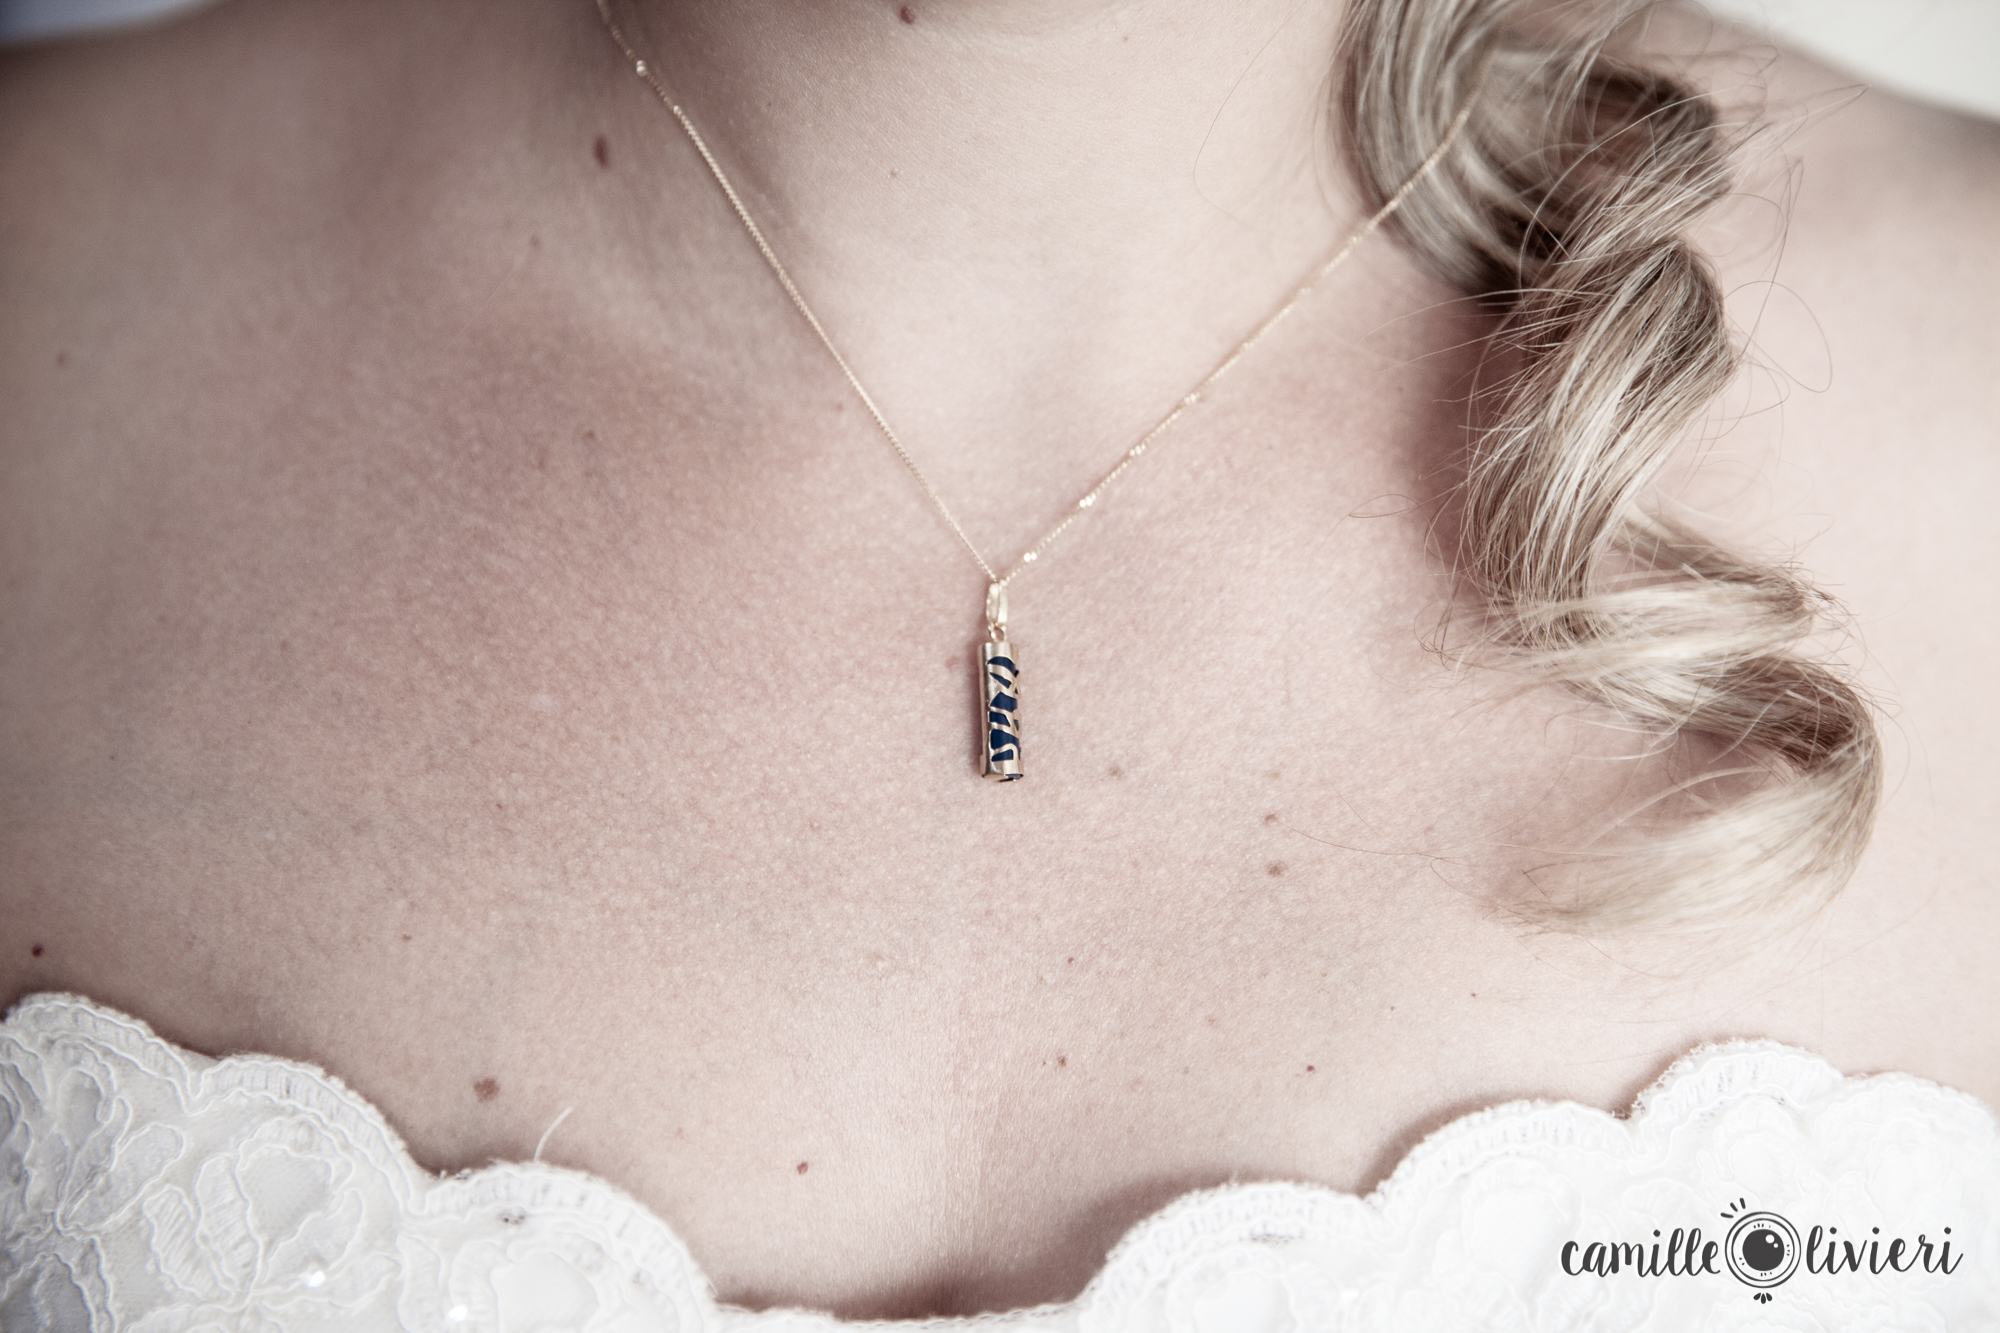 photographe_grenoble_mariage-camille-olivieri-96